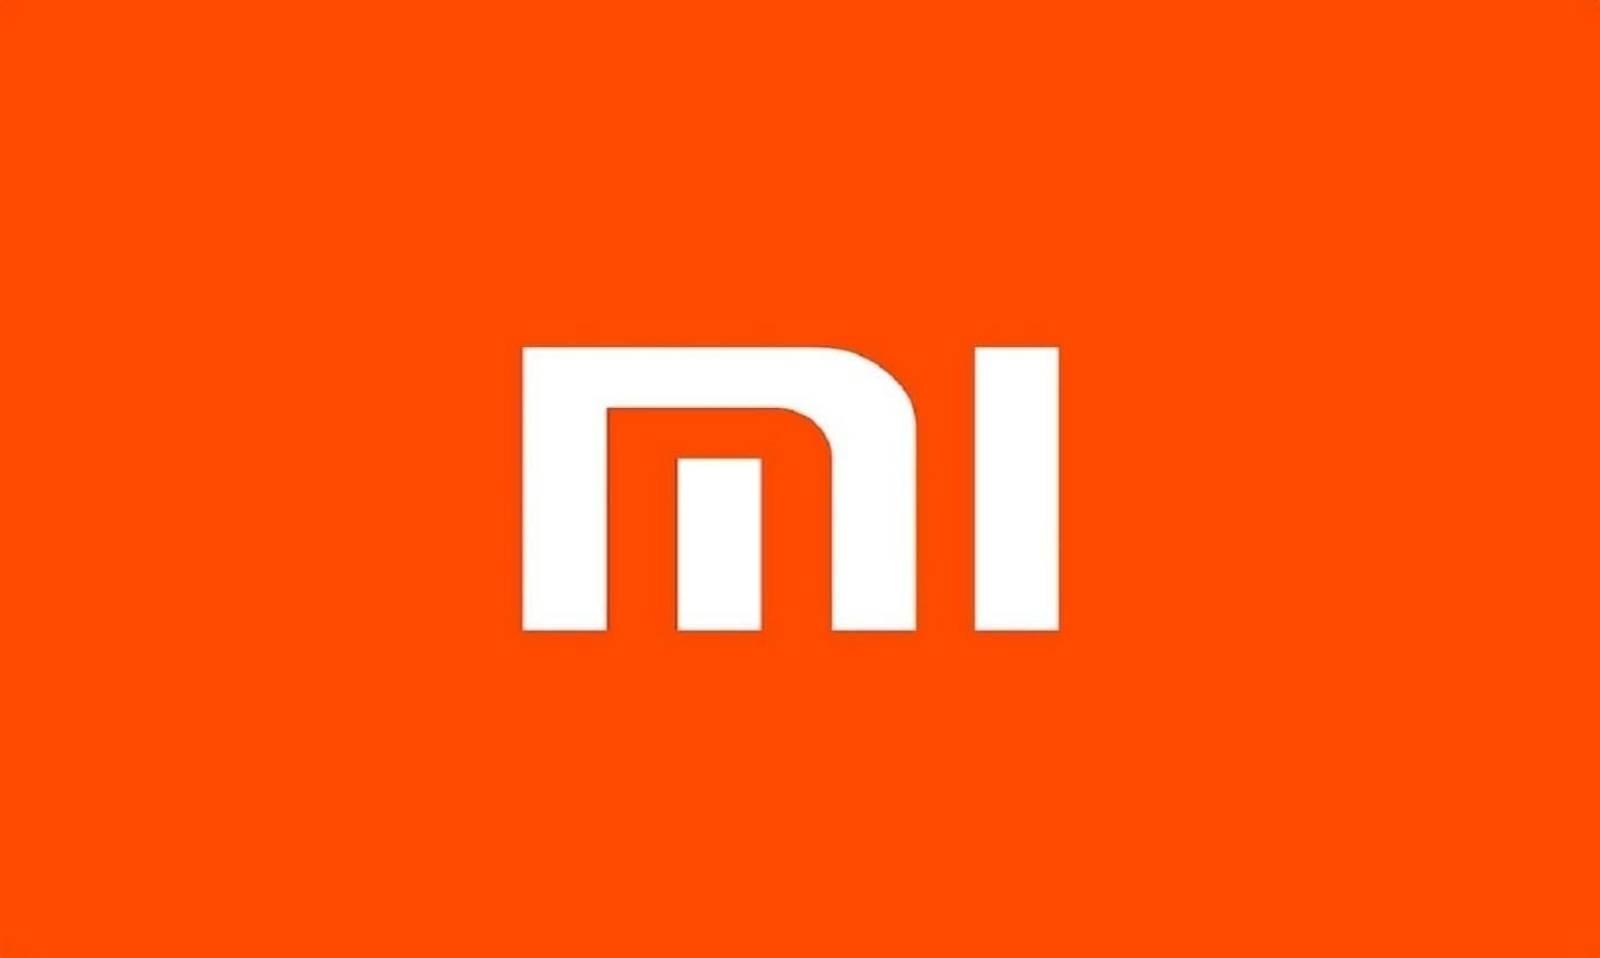 Xiaomi topul inovatoare companii lume